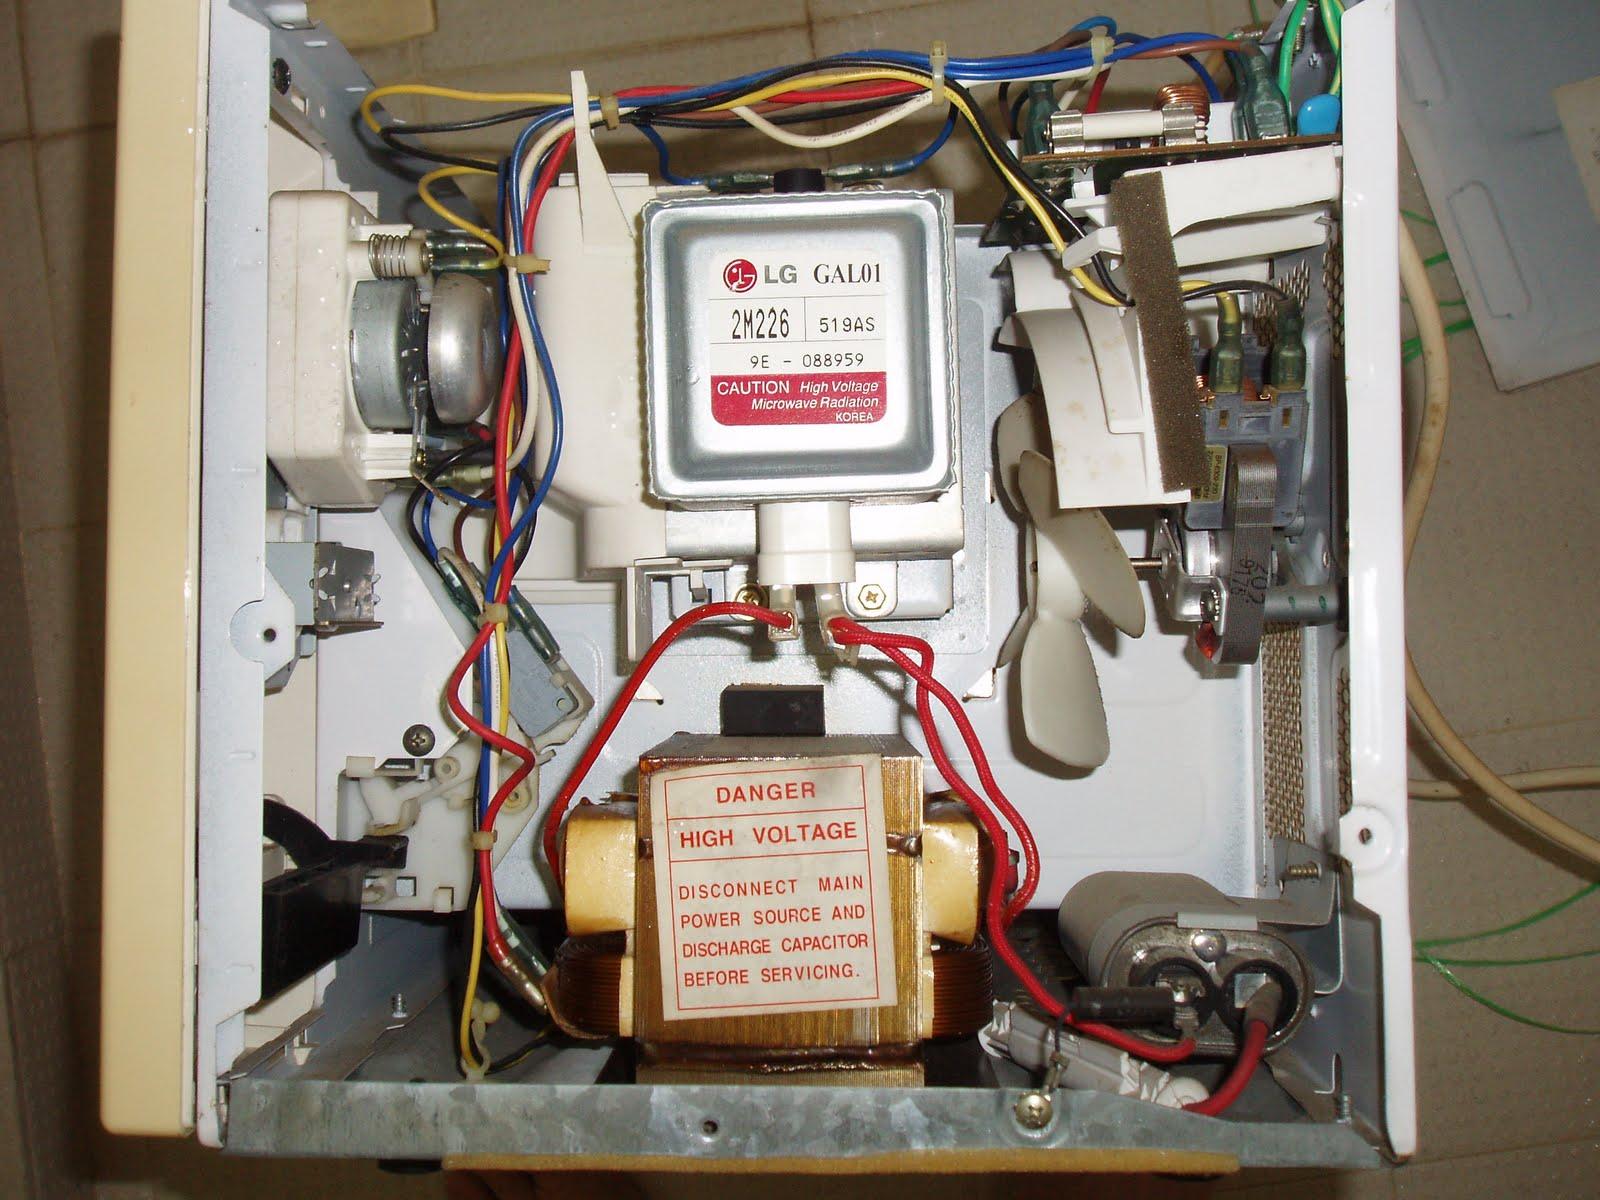 G E Microwave Oven Door Replacement